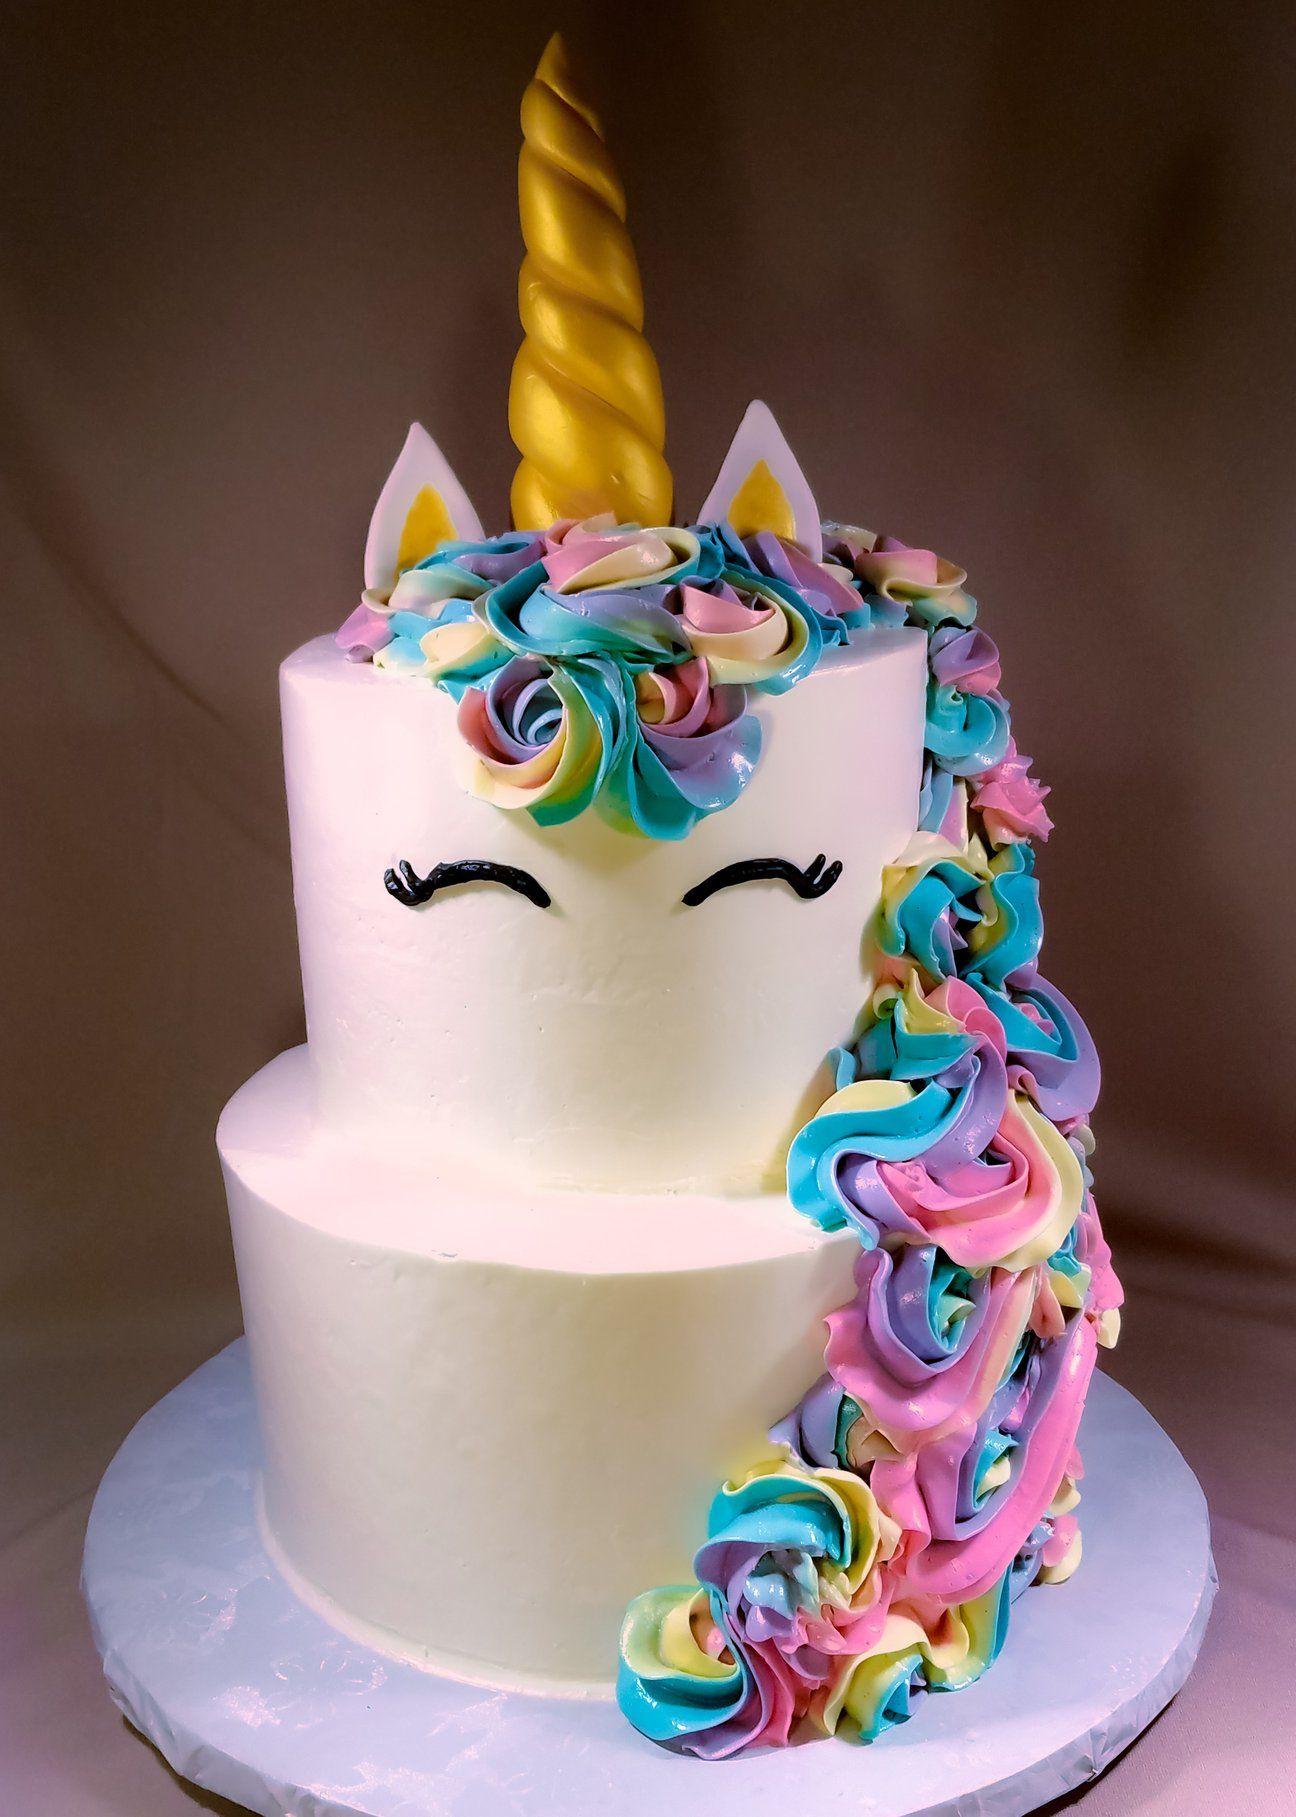 Unicorn Cake 2 Tier Vanilla Birthdays Birthday